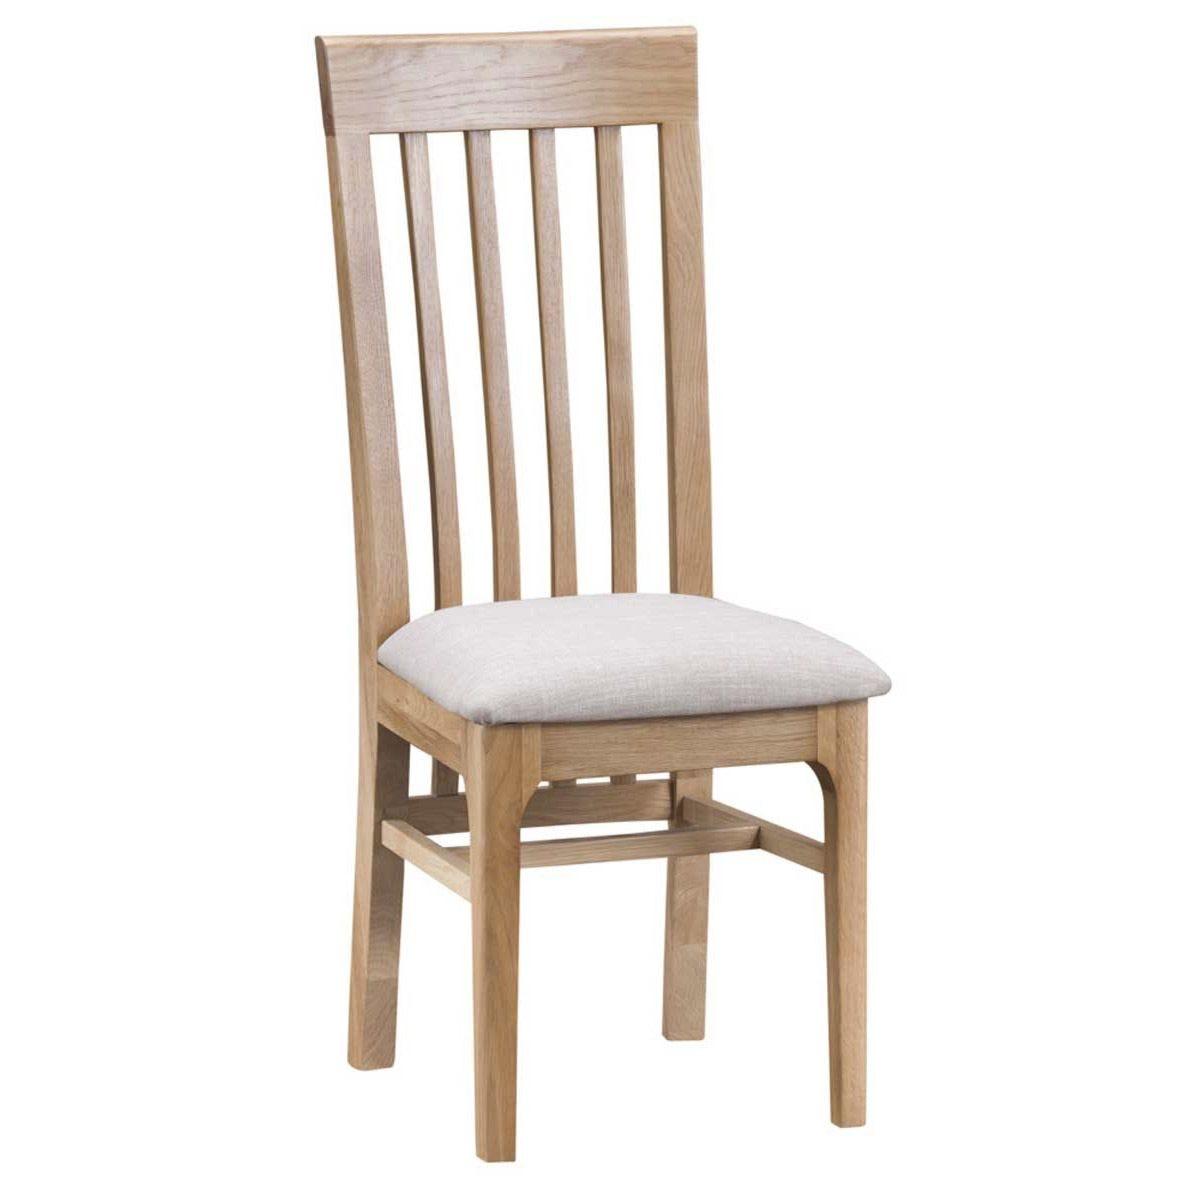 Cranbrook Natural Oak Slat Back Chair with Fabric Seat